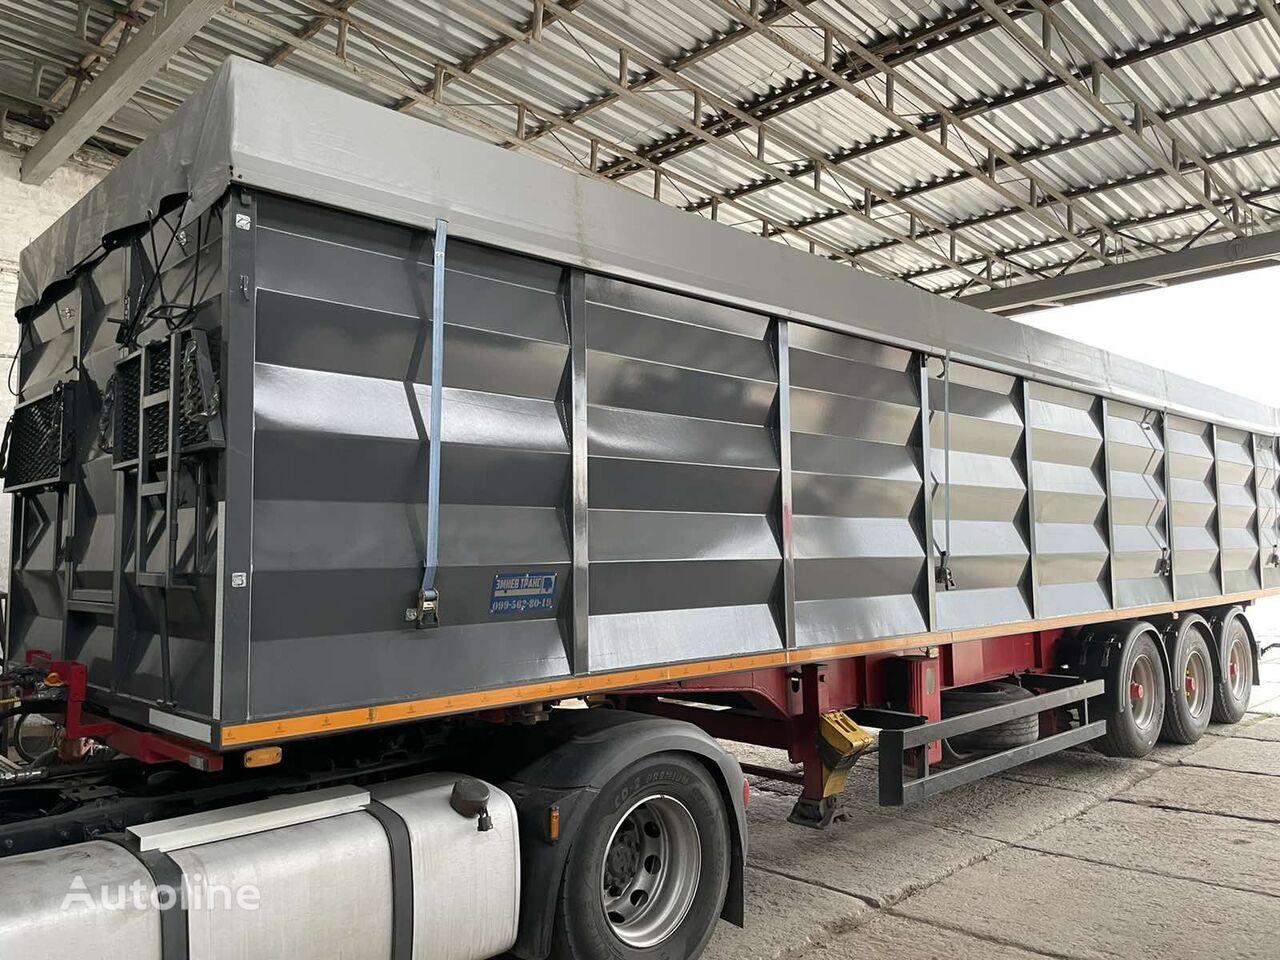 SCHMITZ CARGOBULL SPR 24 Konteynerovoz samosval zernovoz 60m3 tipper semi-trailer